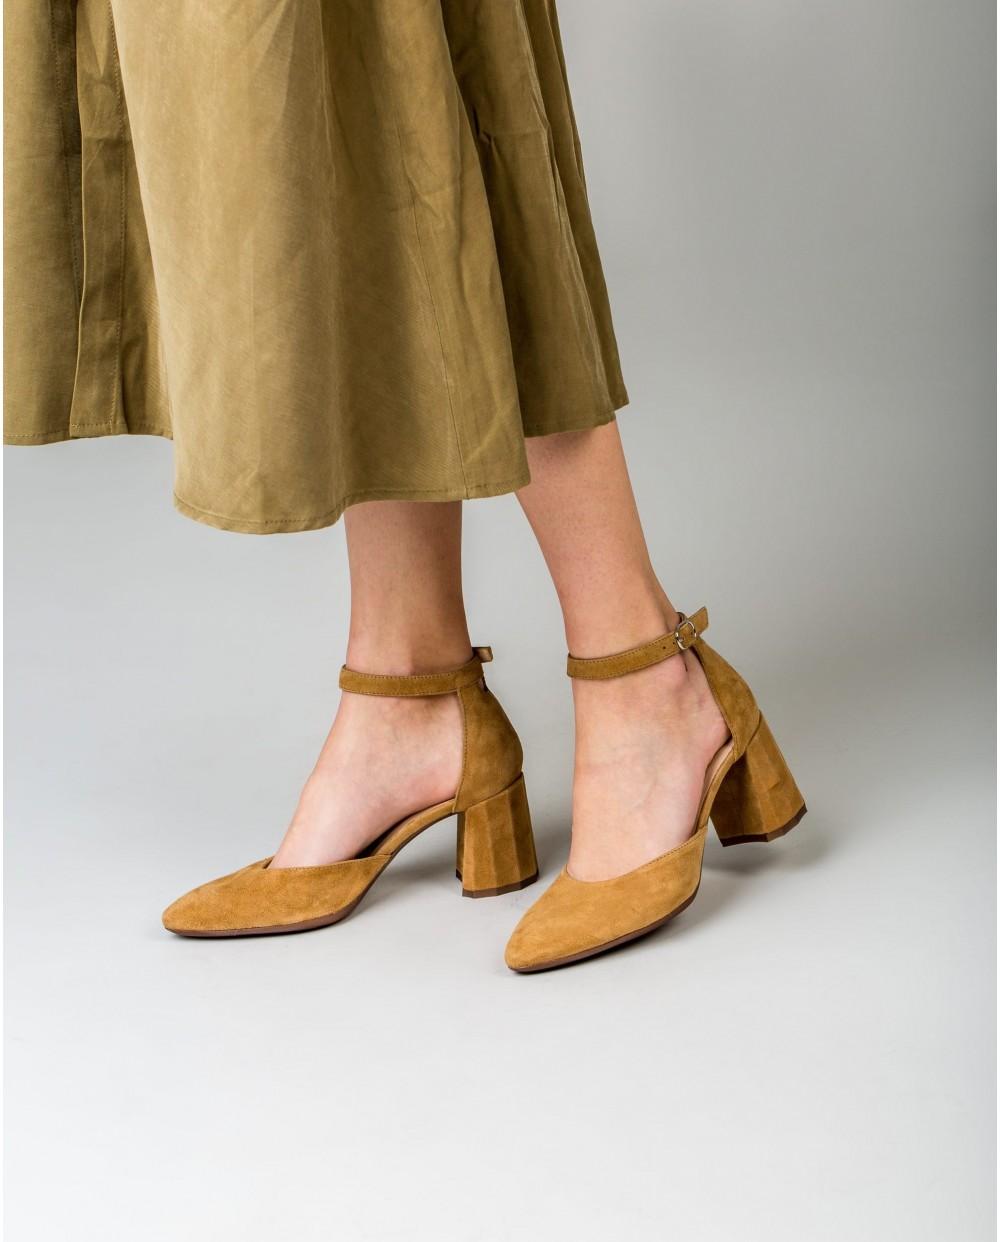 Wonders-Women-Backless high heeled shoe